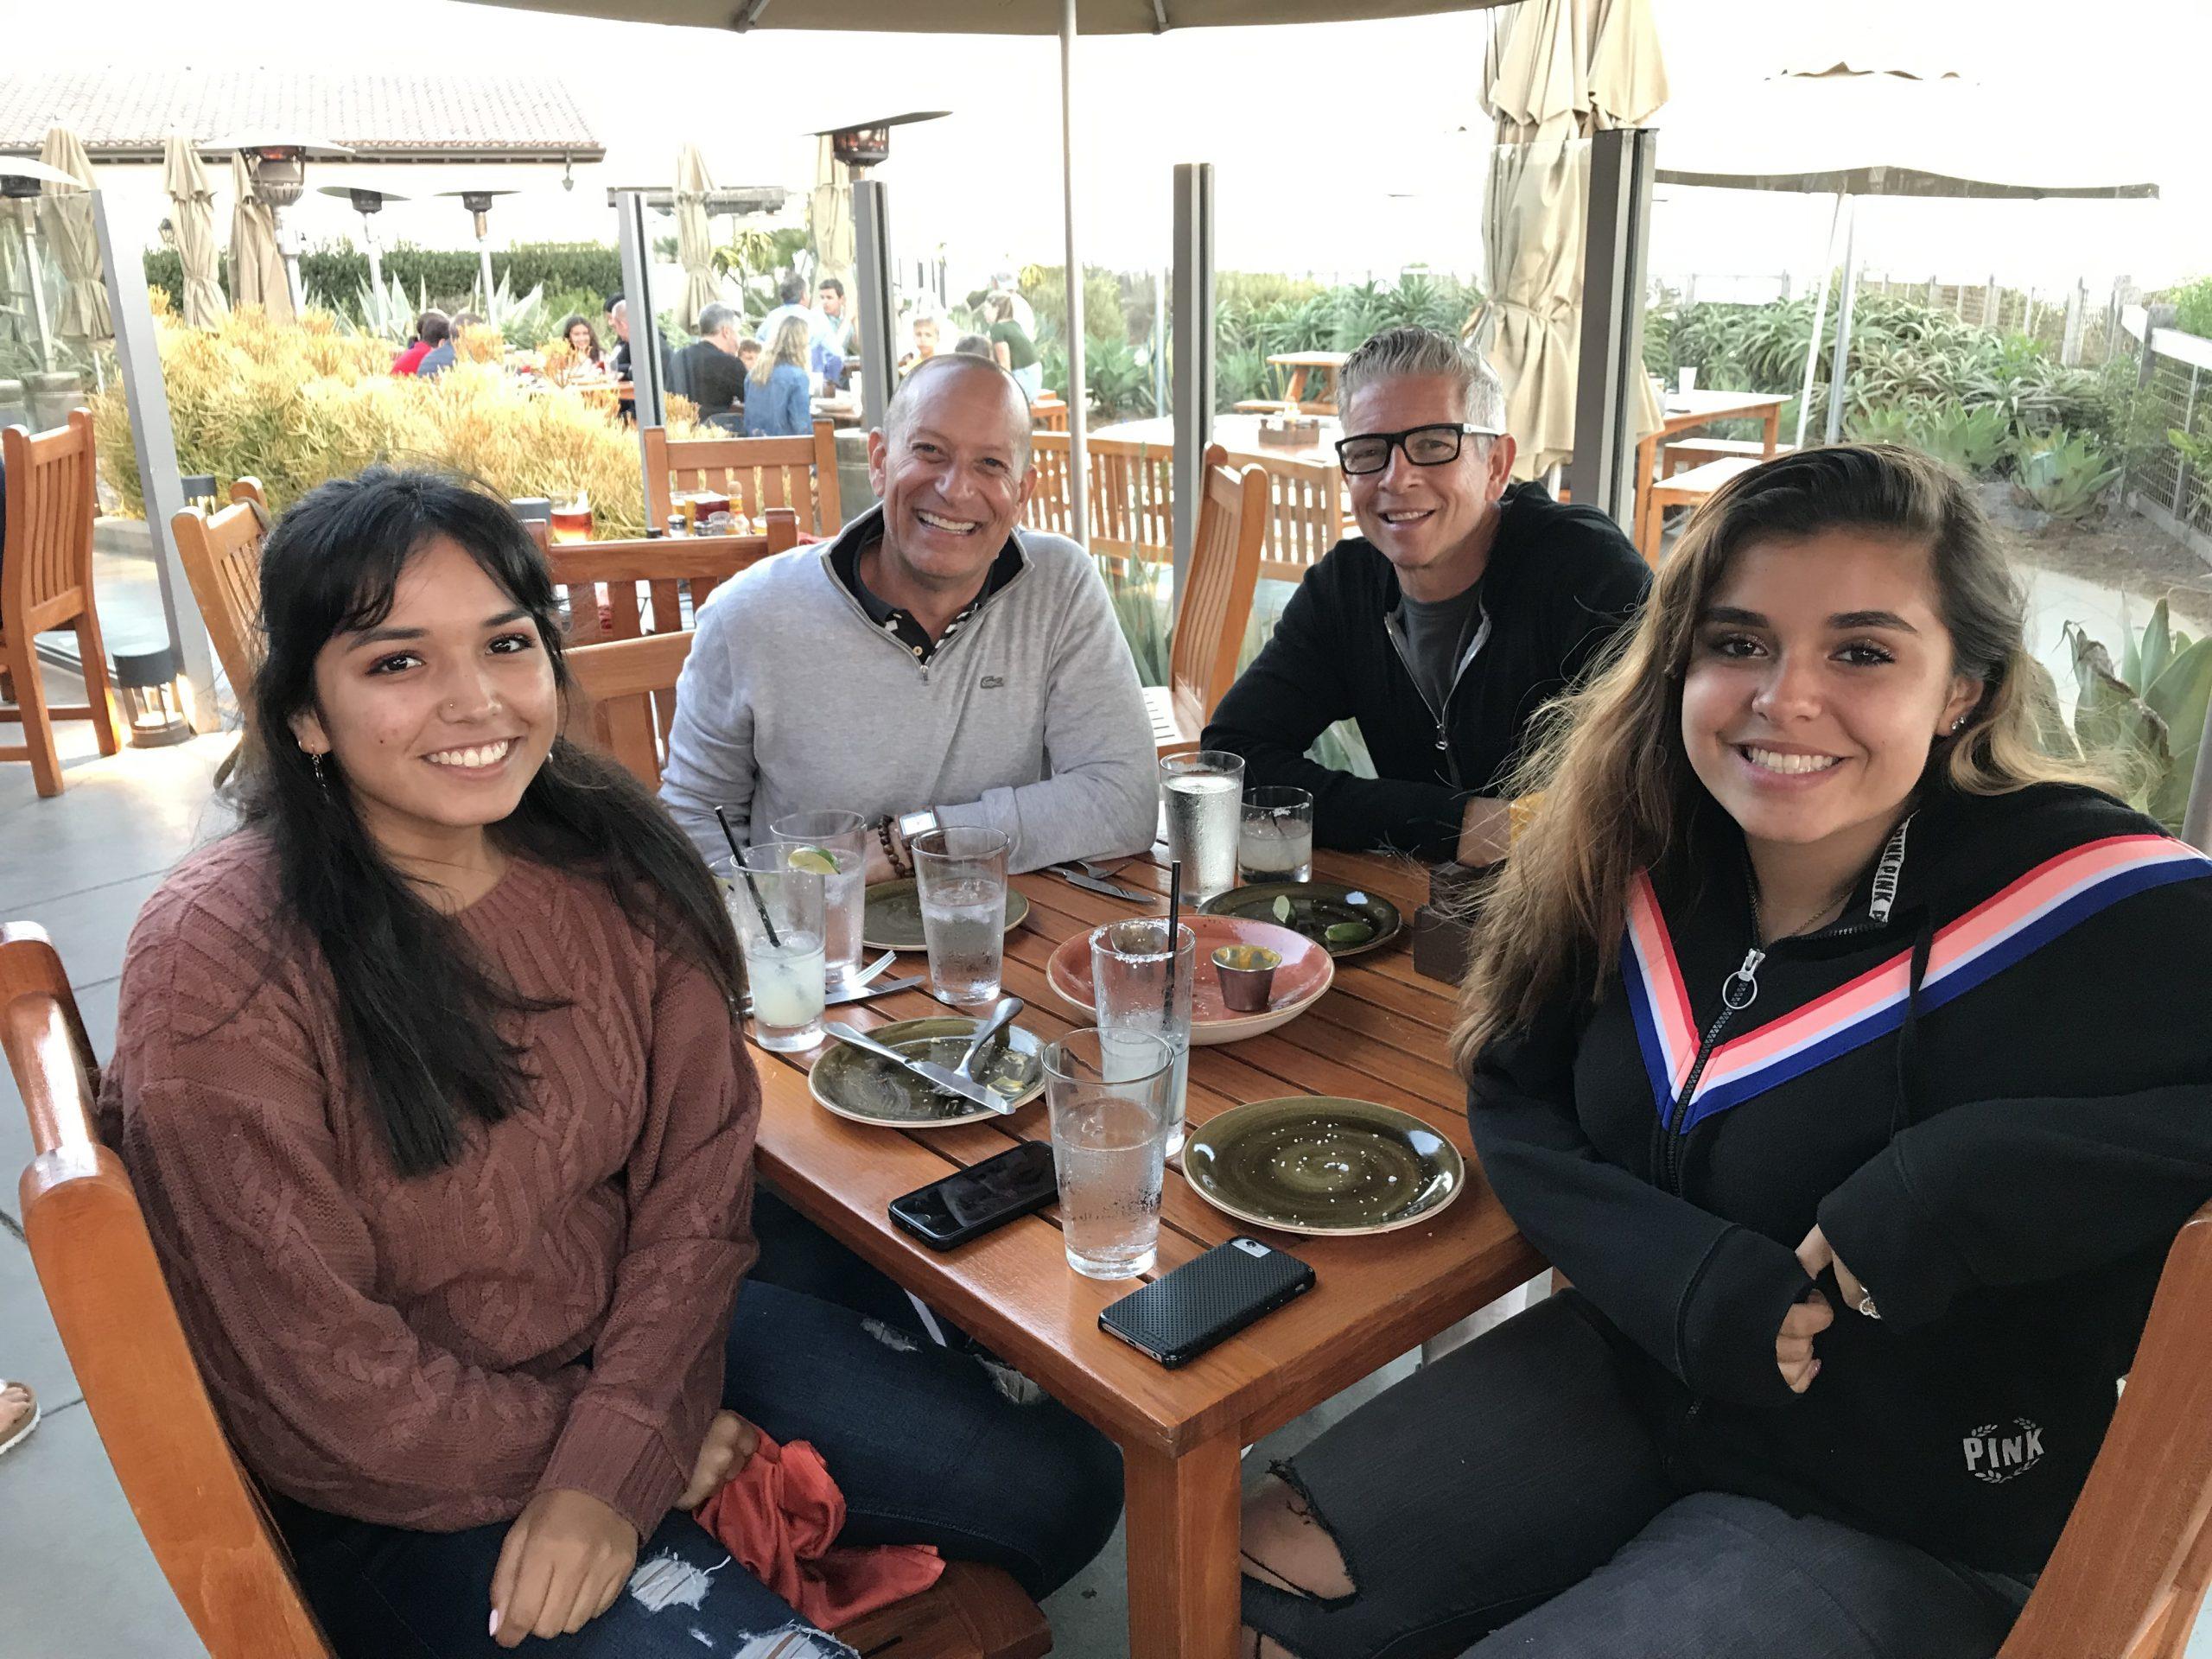 family dining outdoors at Terranea Resort in Ranch Palos Verde, CA